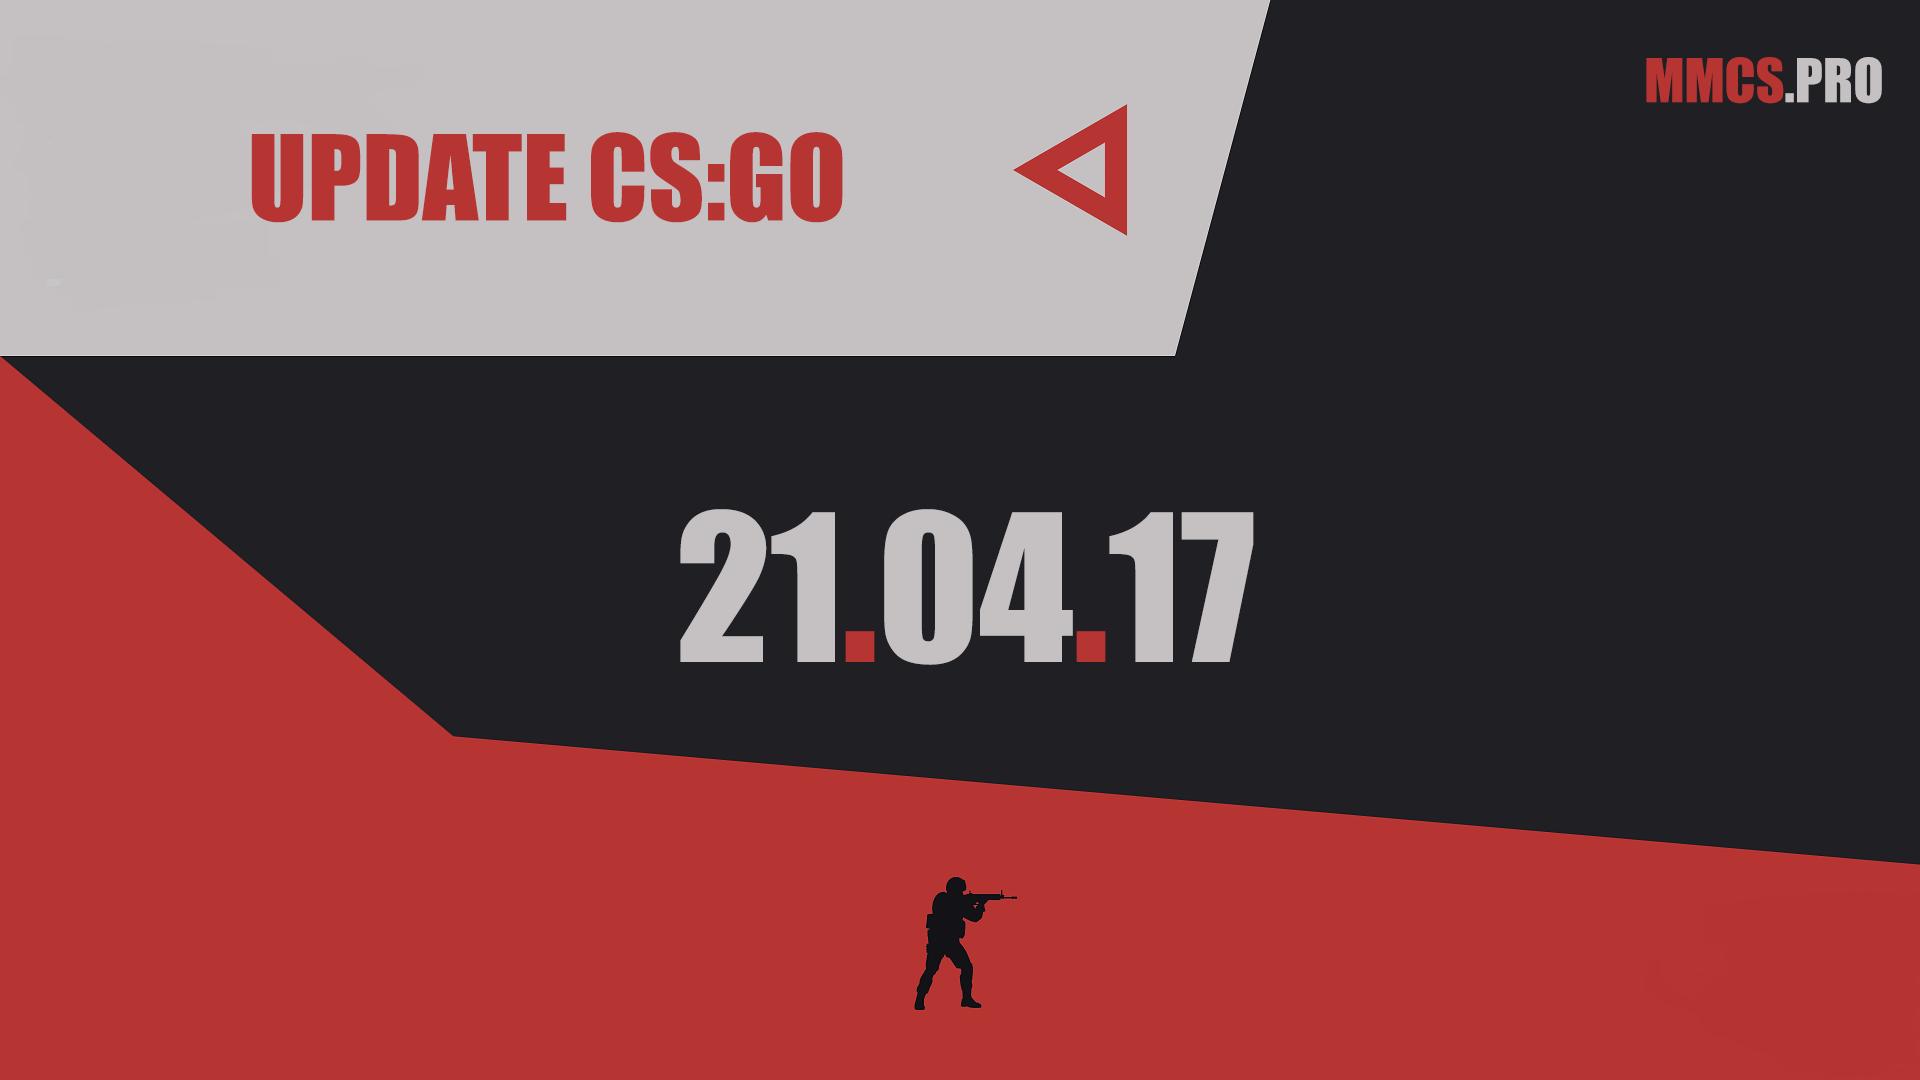 https://mmcs.pro/update-csgo-21-04-2017-valve/